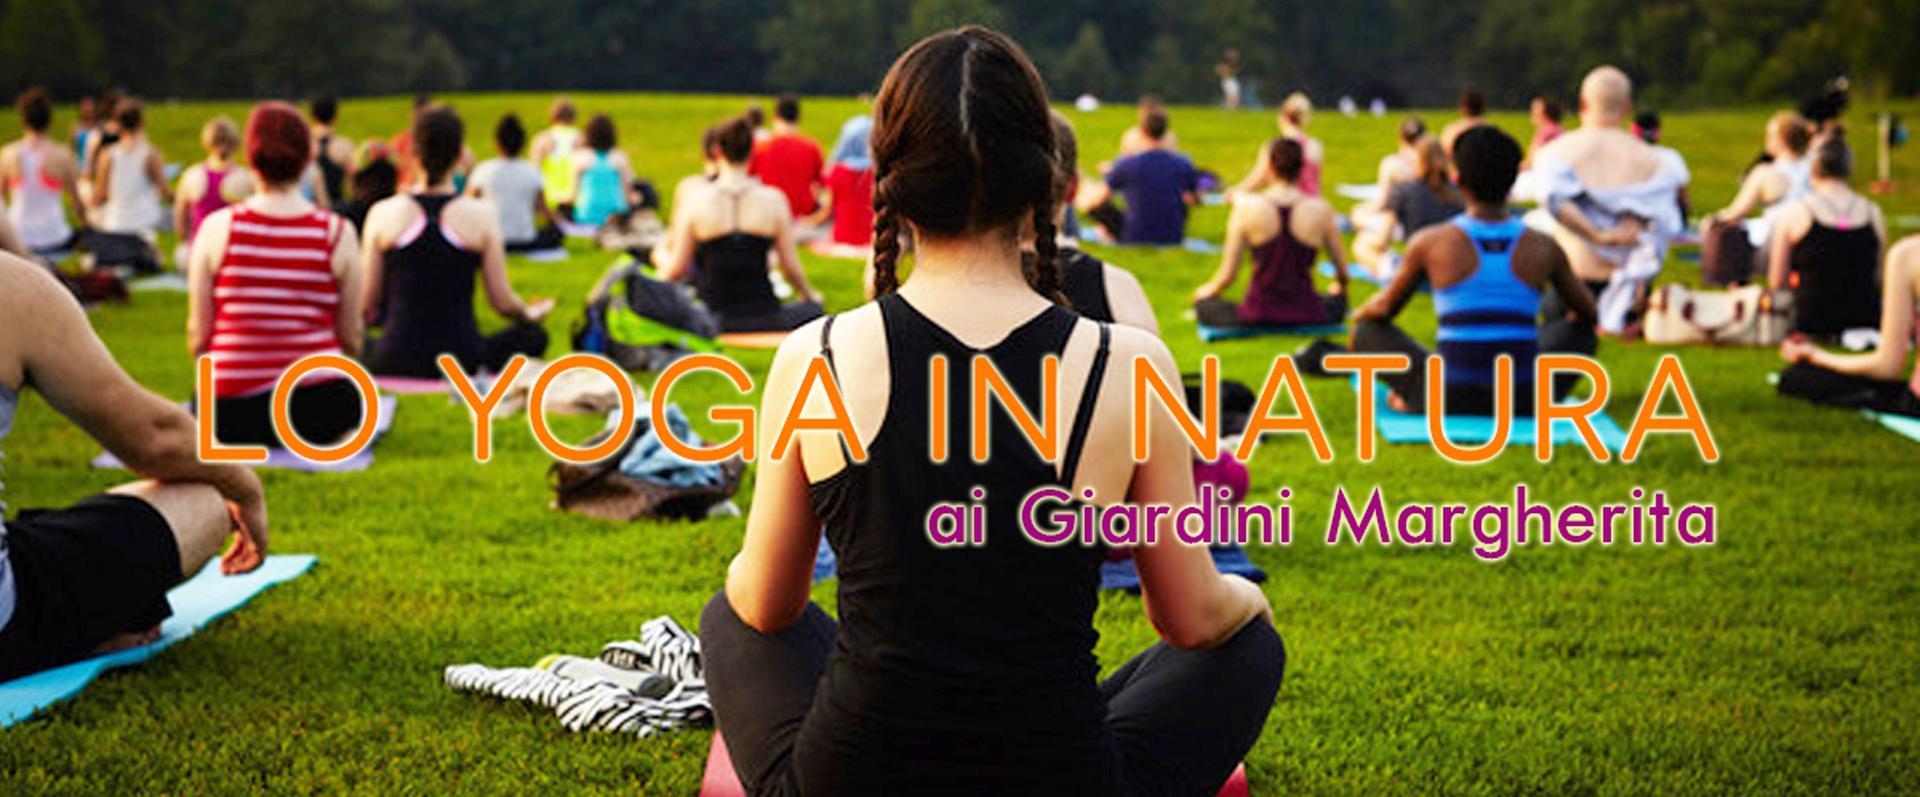 yoga al parco bologna